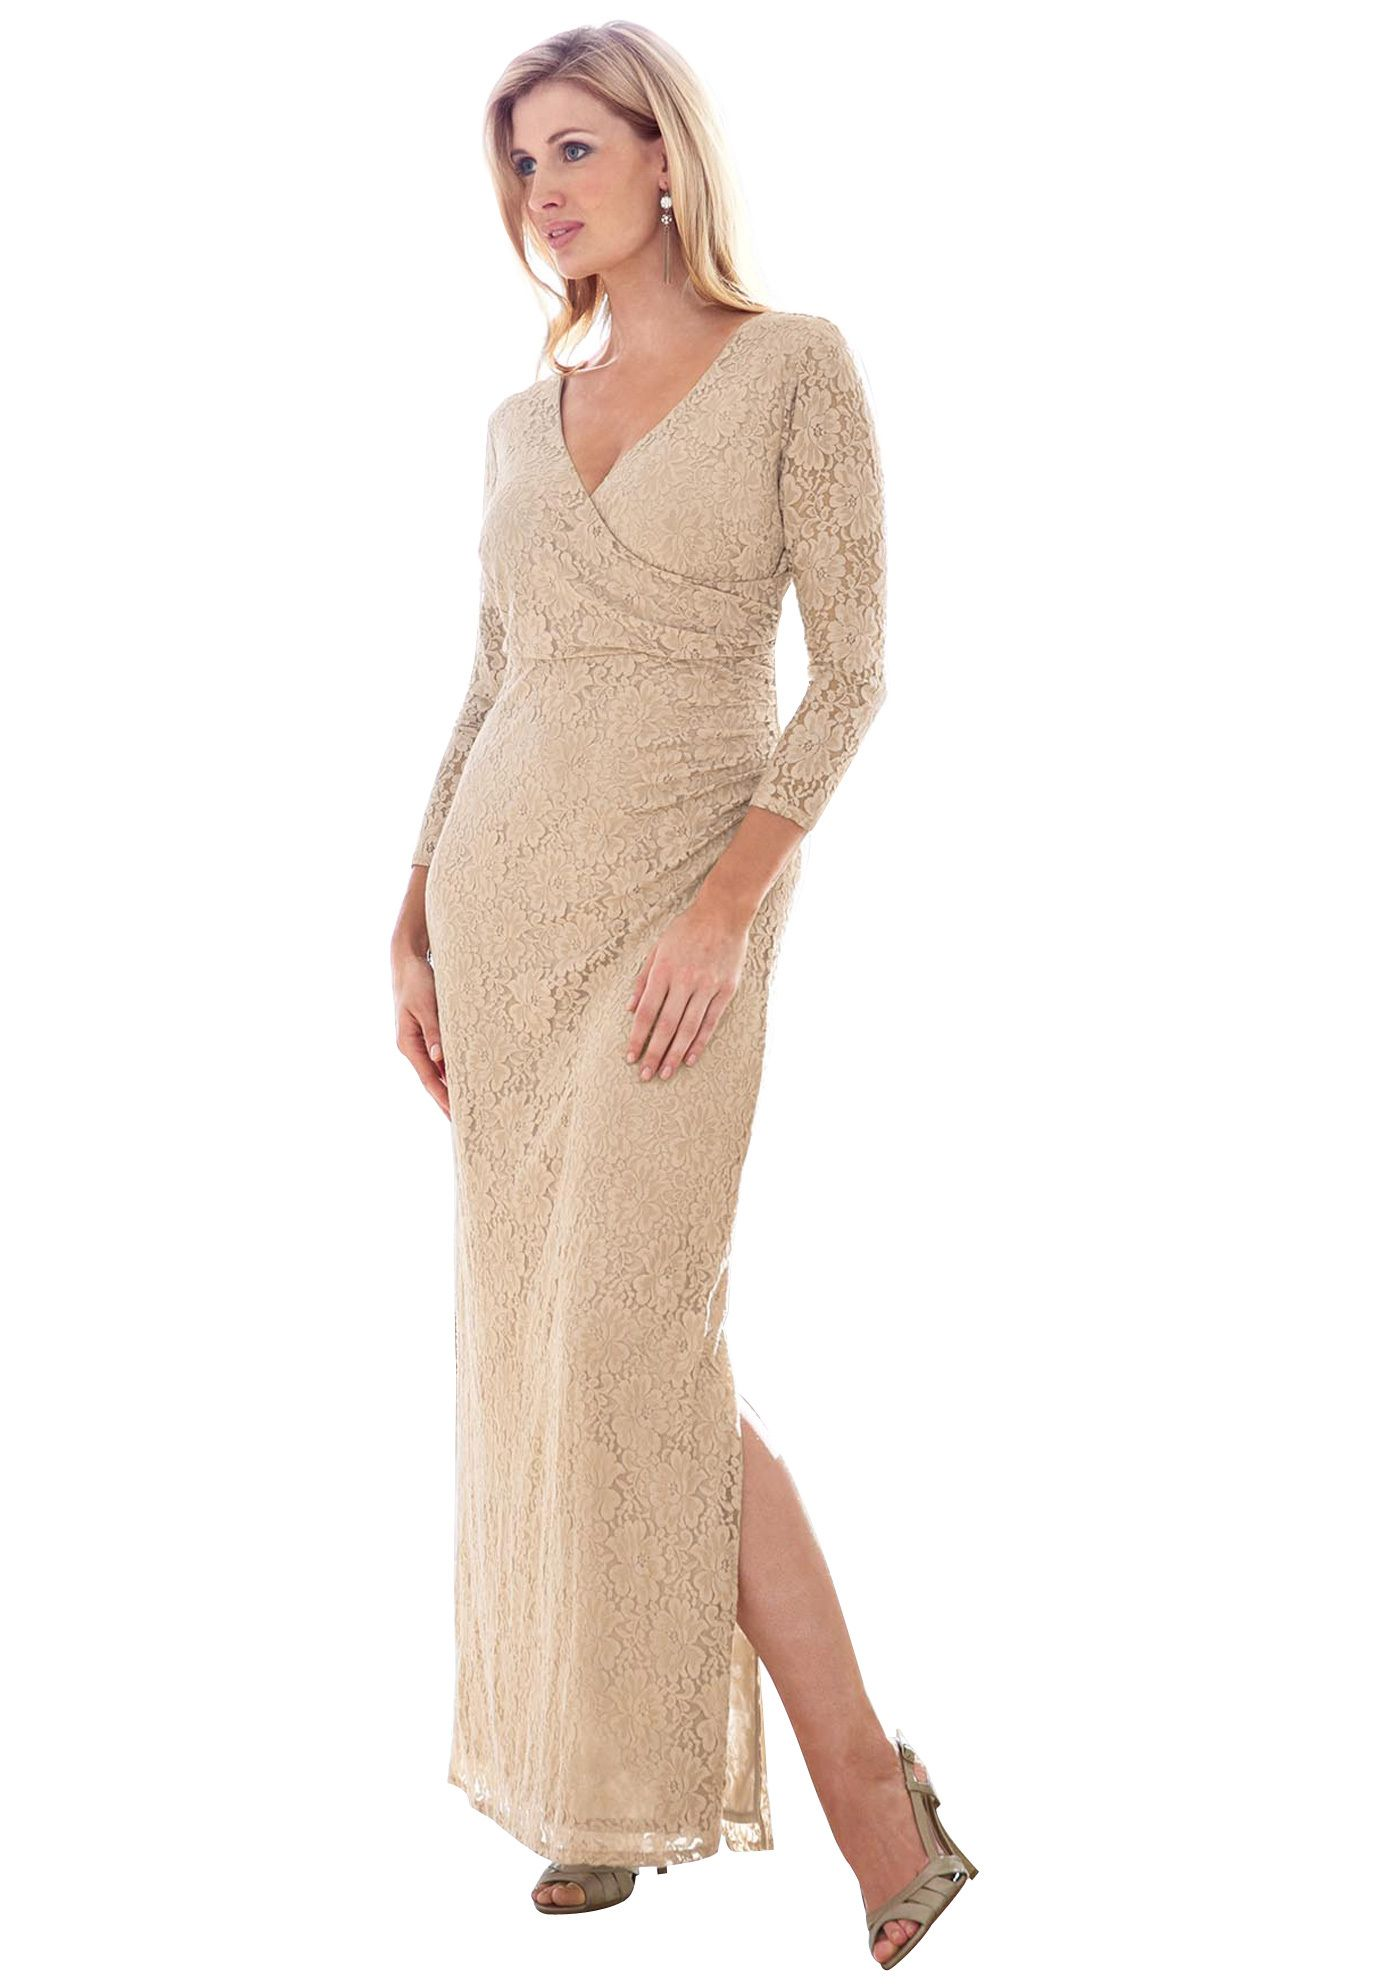 17 Best Images About Dresses On Pinterest Evening Dresses Online